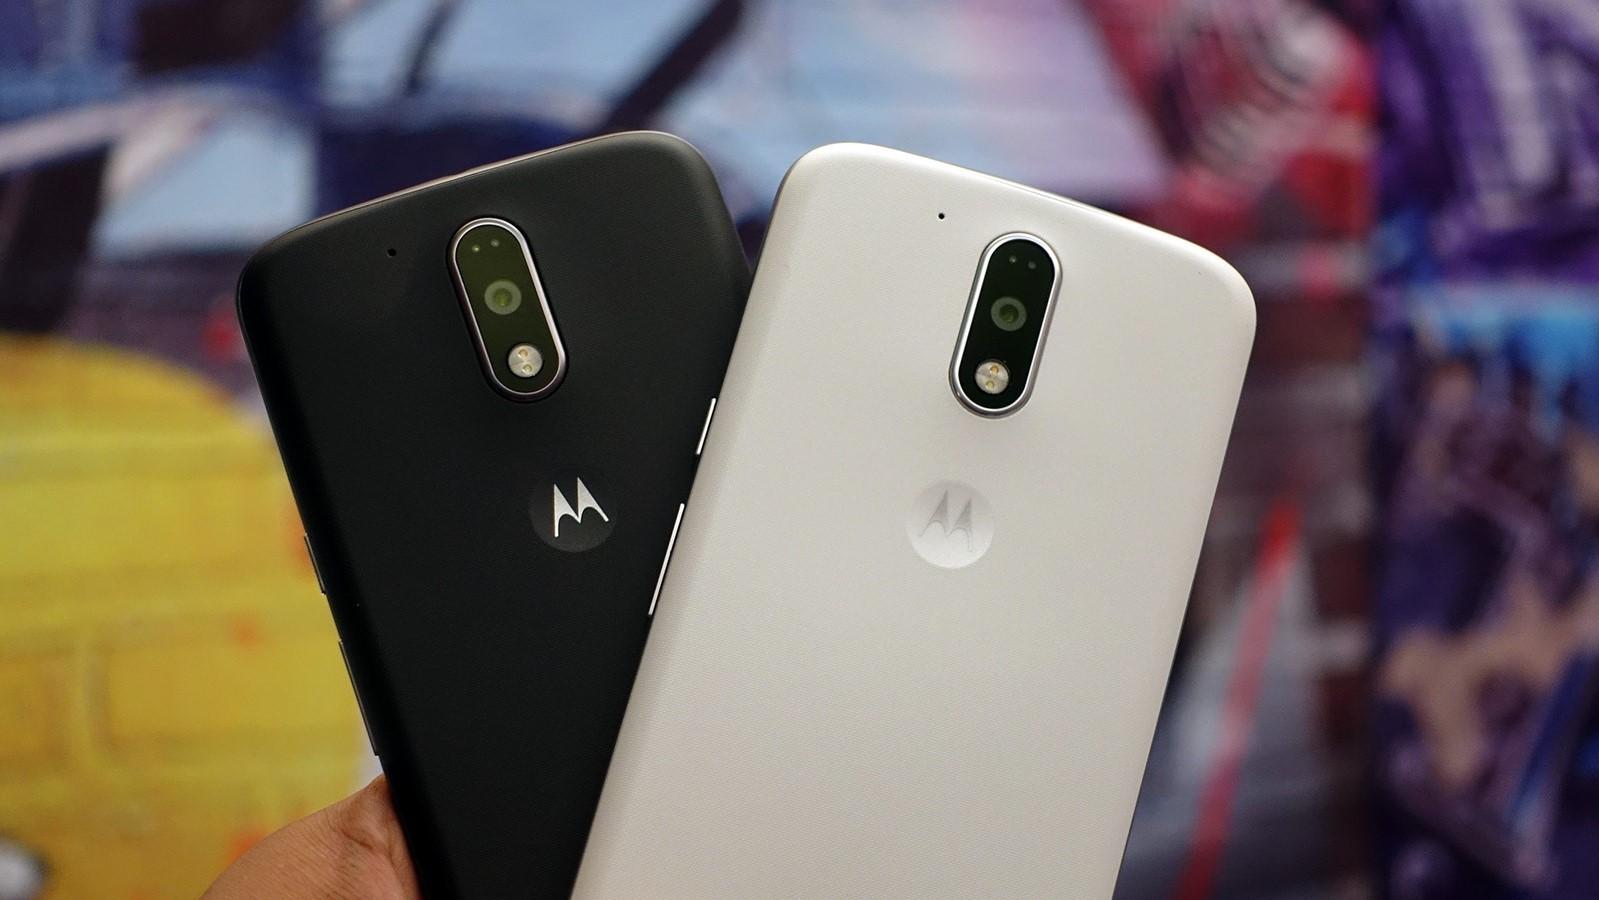 Moto G4 и Moto G4 Plus скоро получат апдейт до Android Oreo